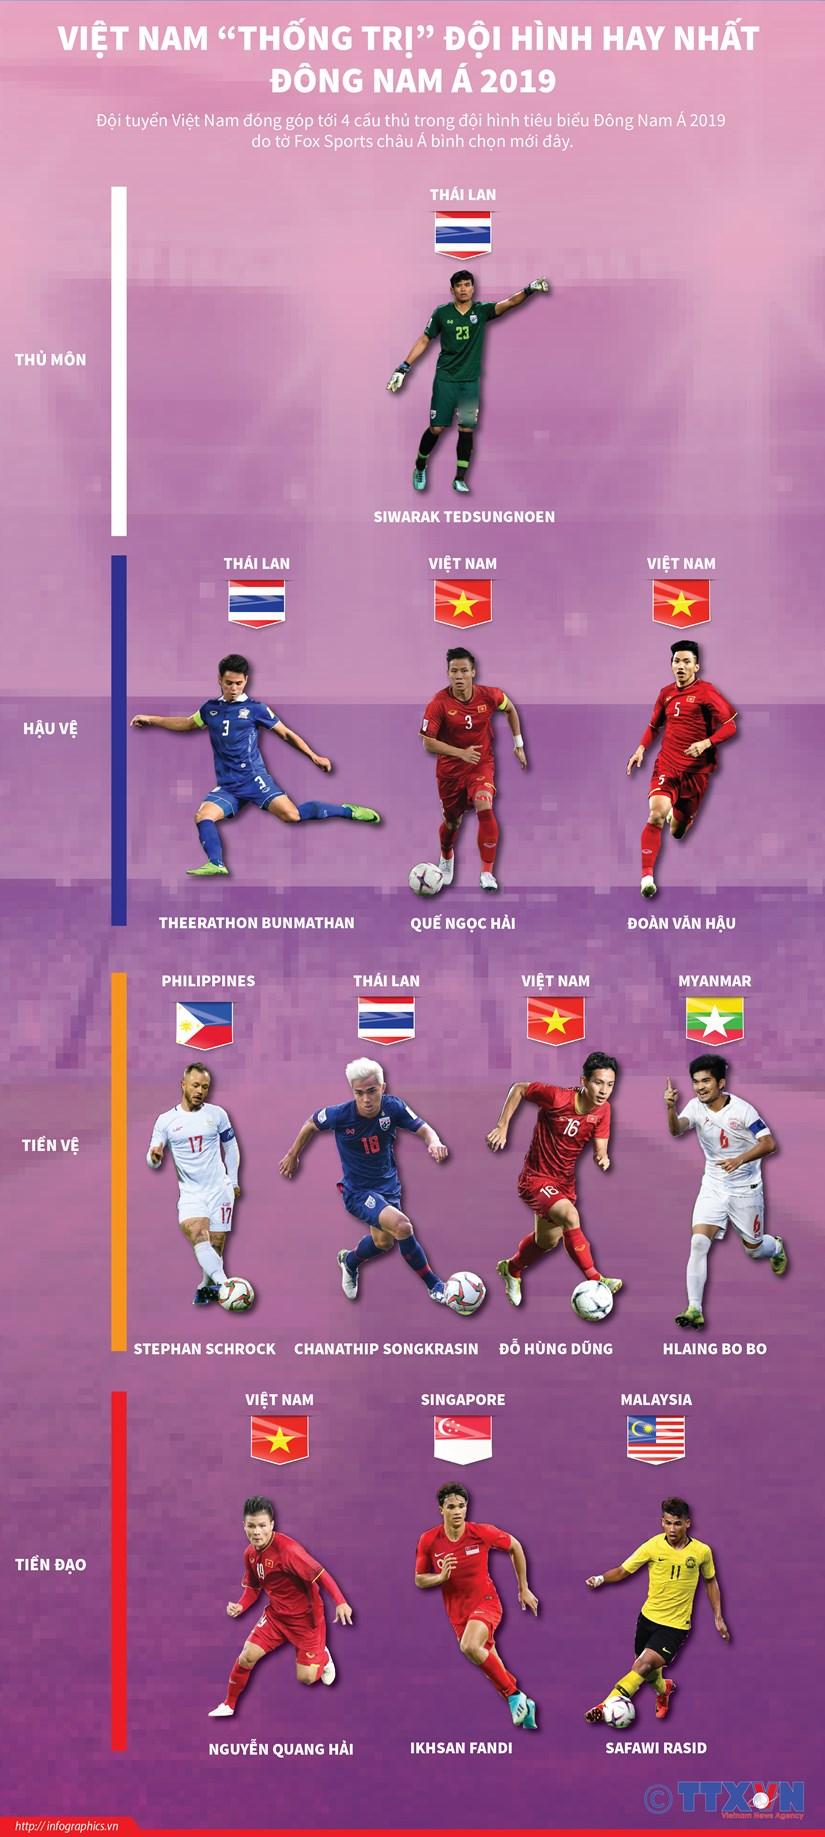 [Infographics] Diem mat doi hinh hay nhat Dong Nam A 2019 hinh anh 1